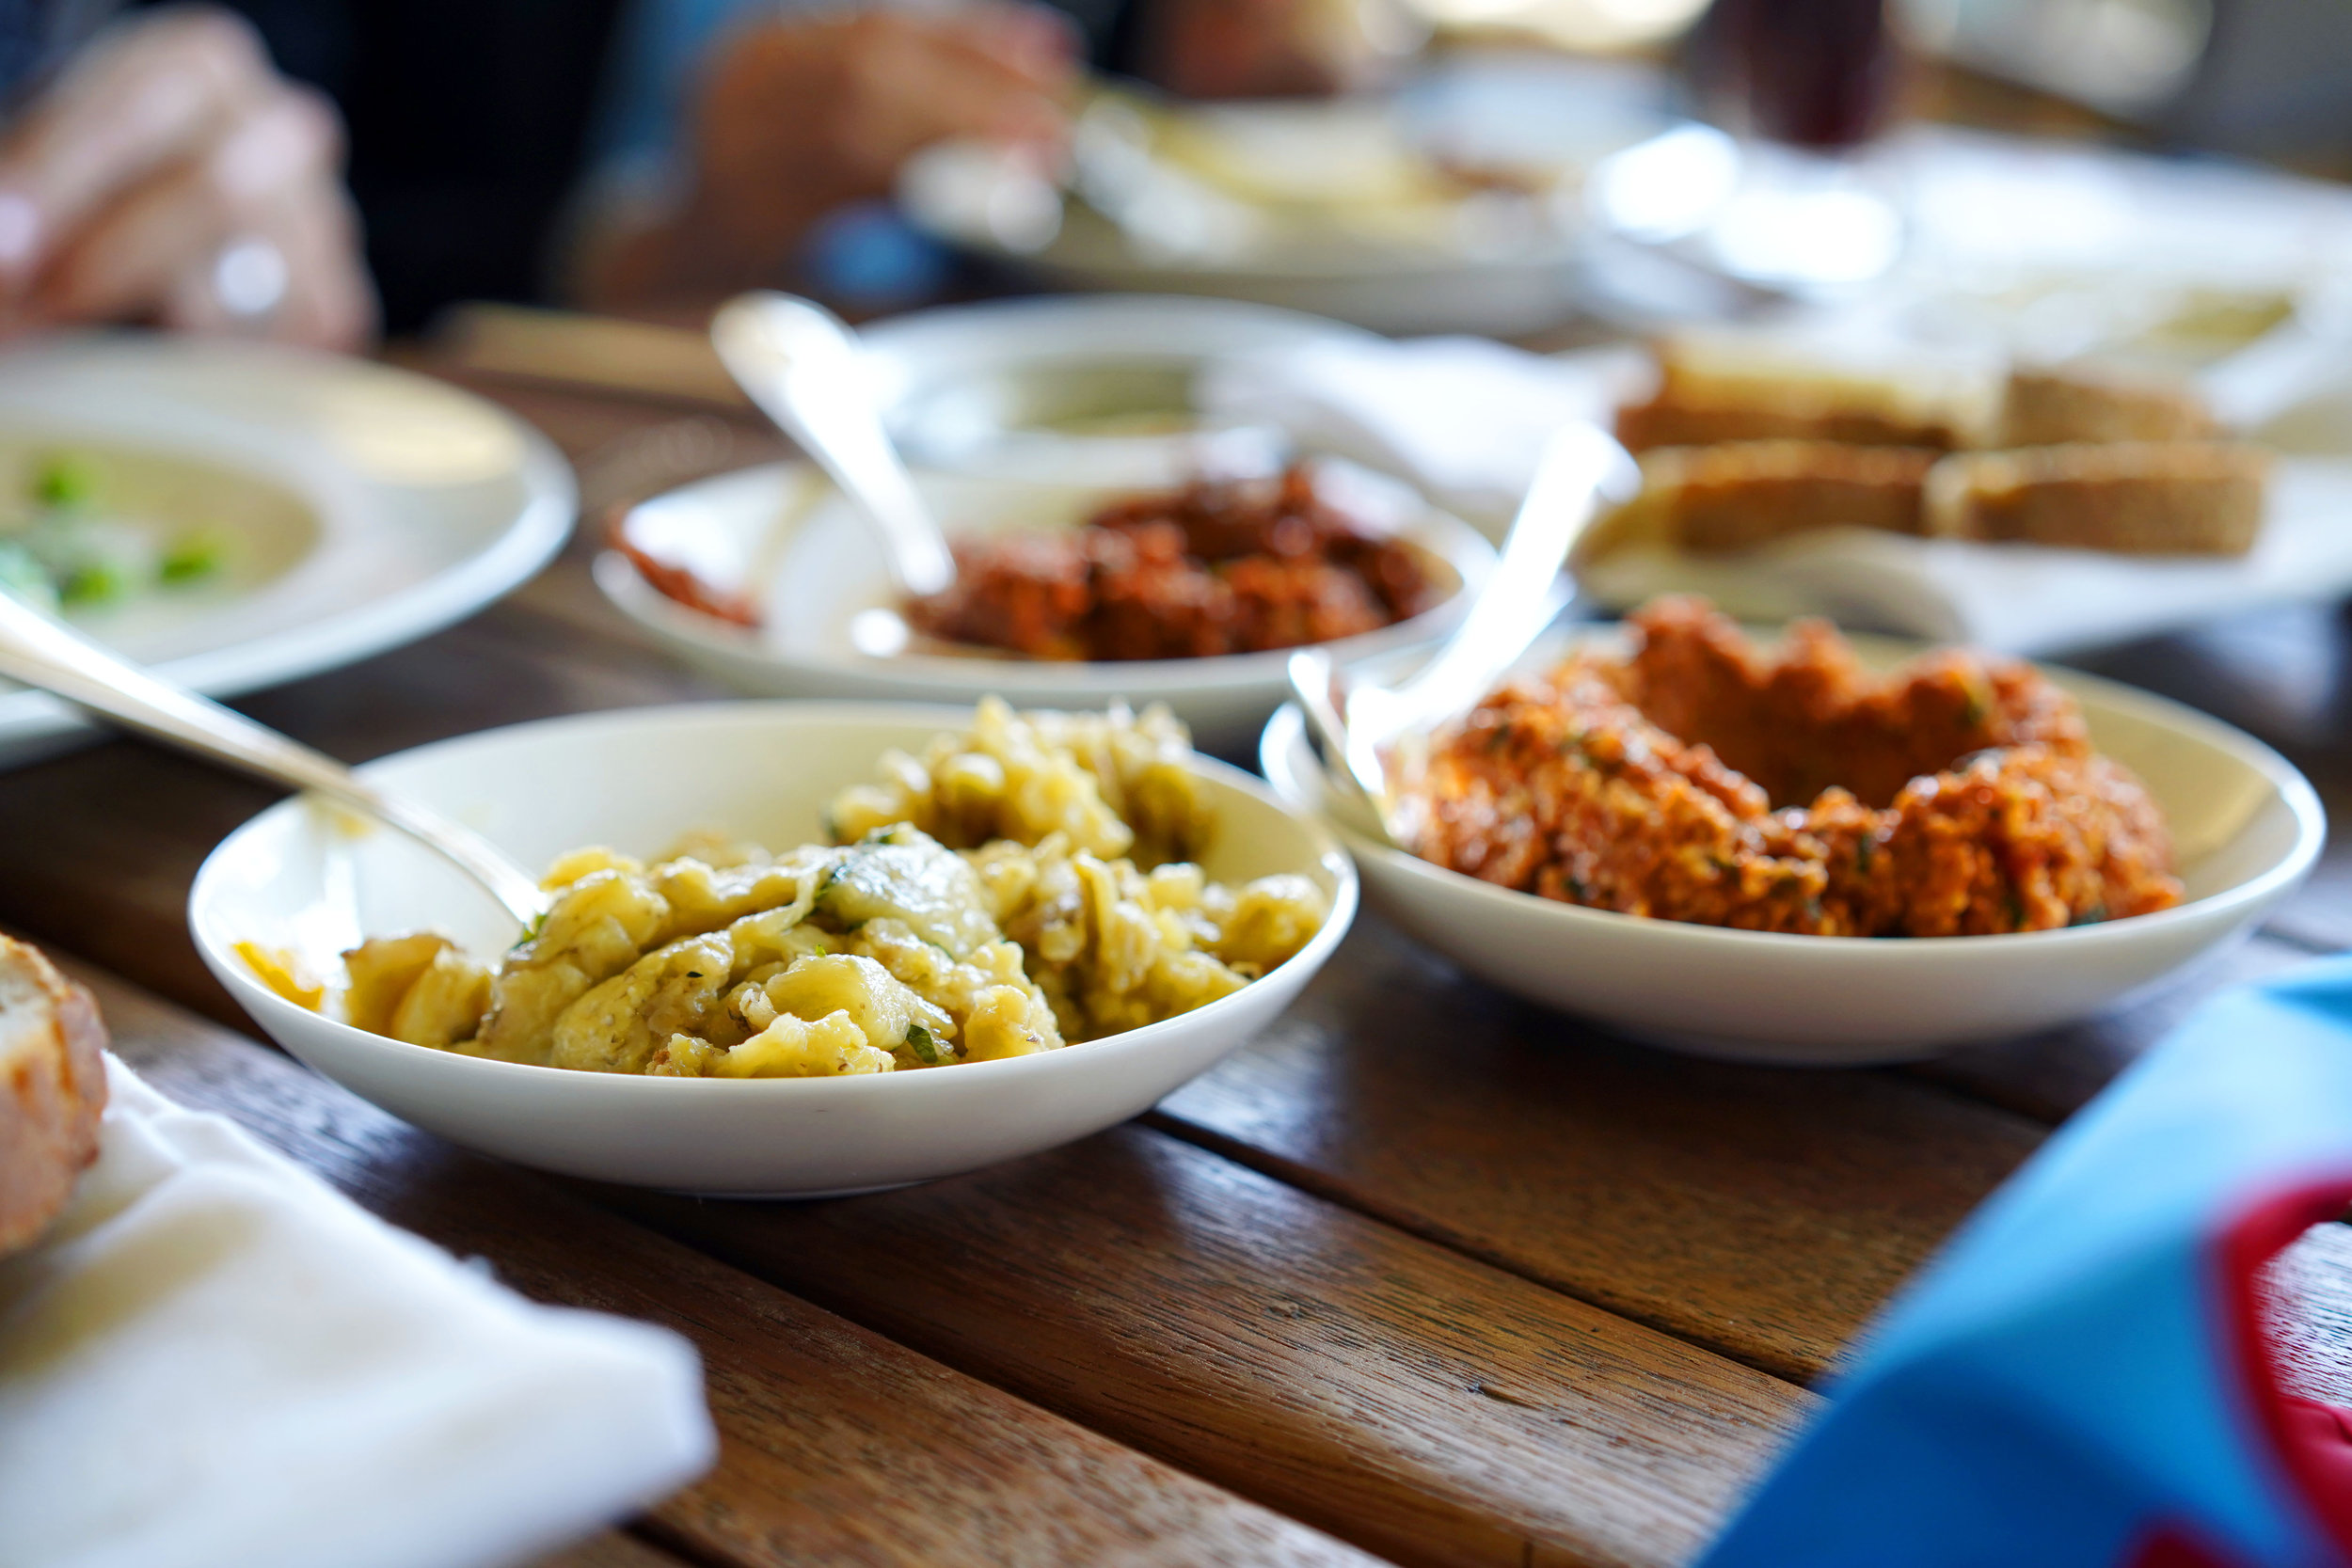 thetravelhub_istanbul_food8.JPG